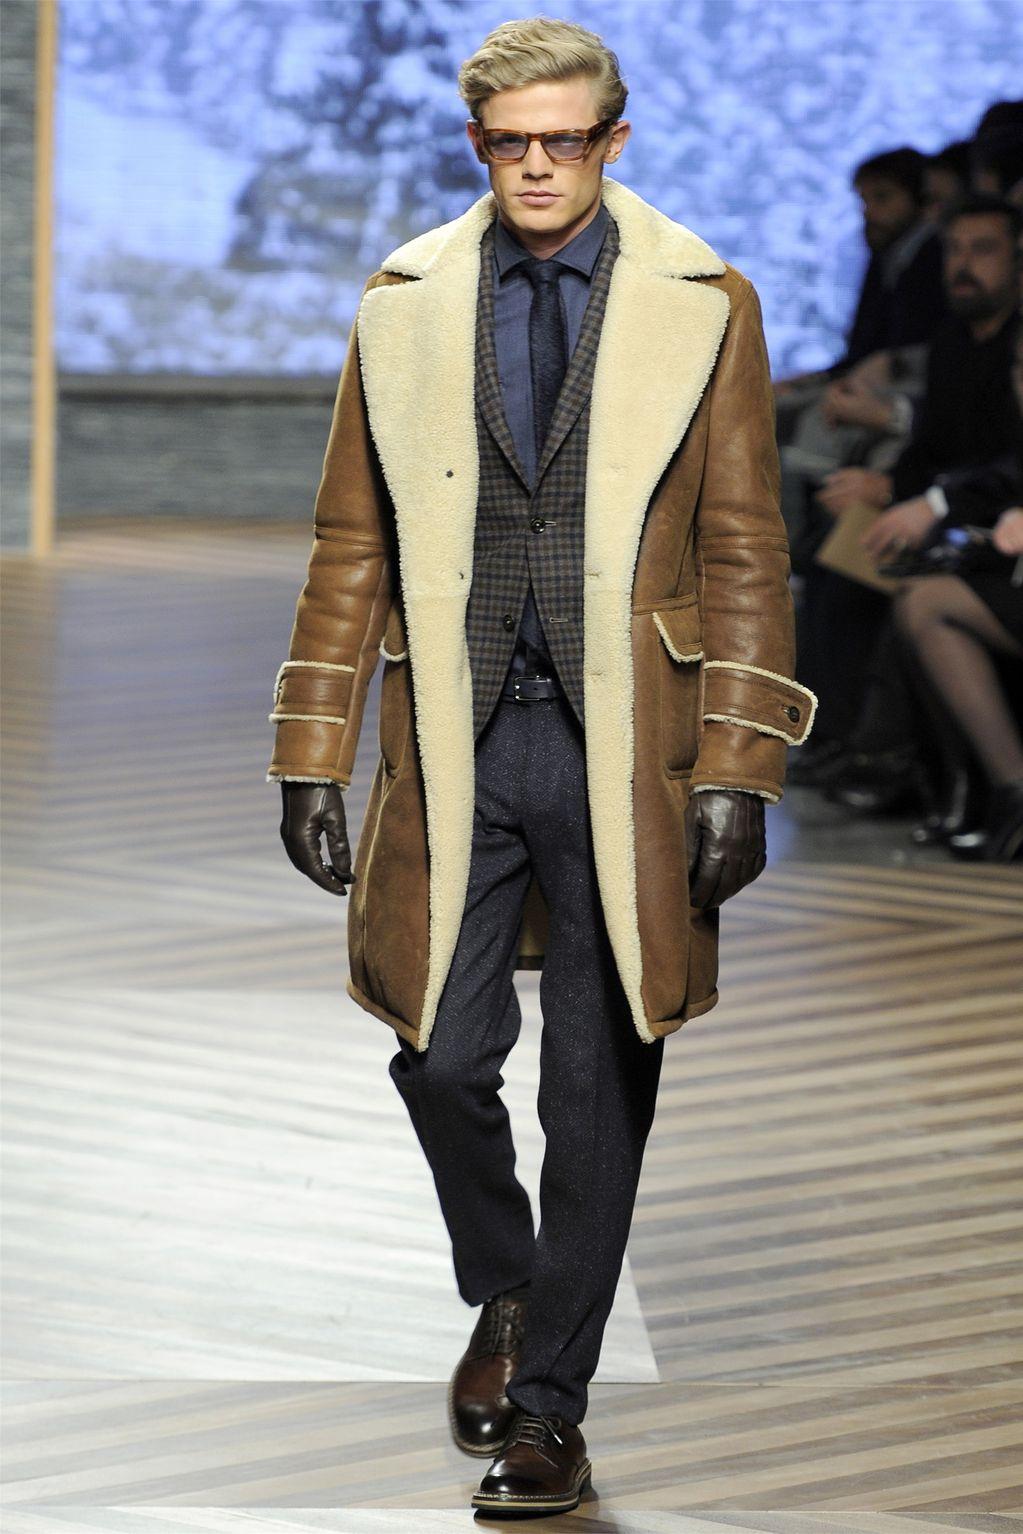 Ermenegildo Zegna Fall/Winter 2012 | Milan Fashion Week